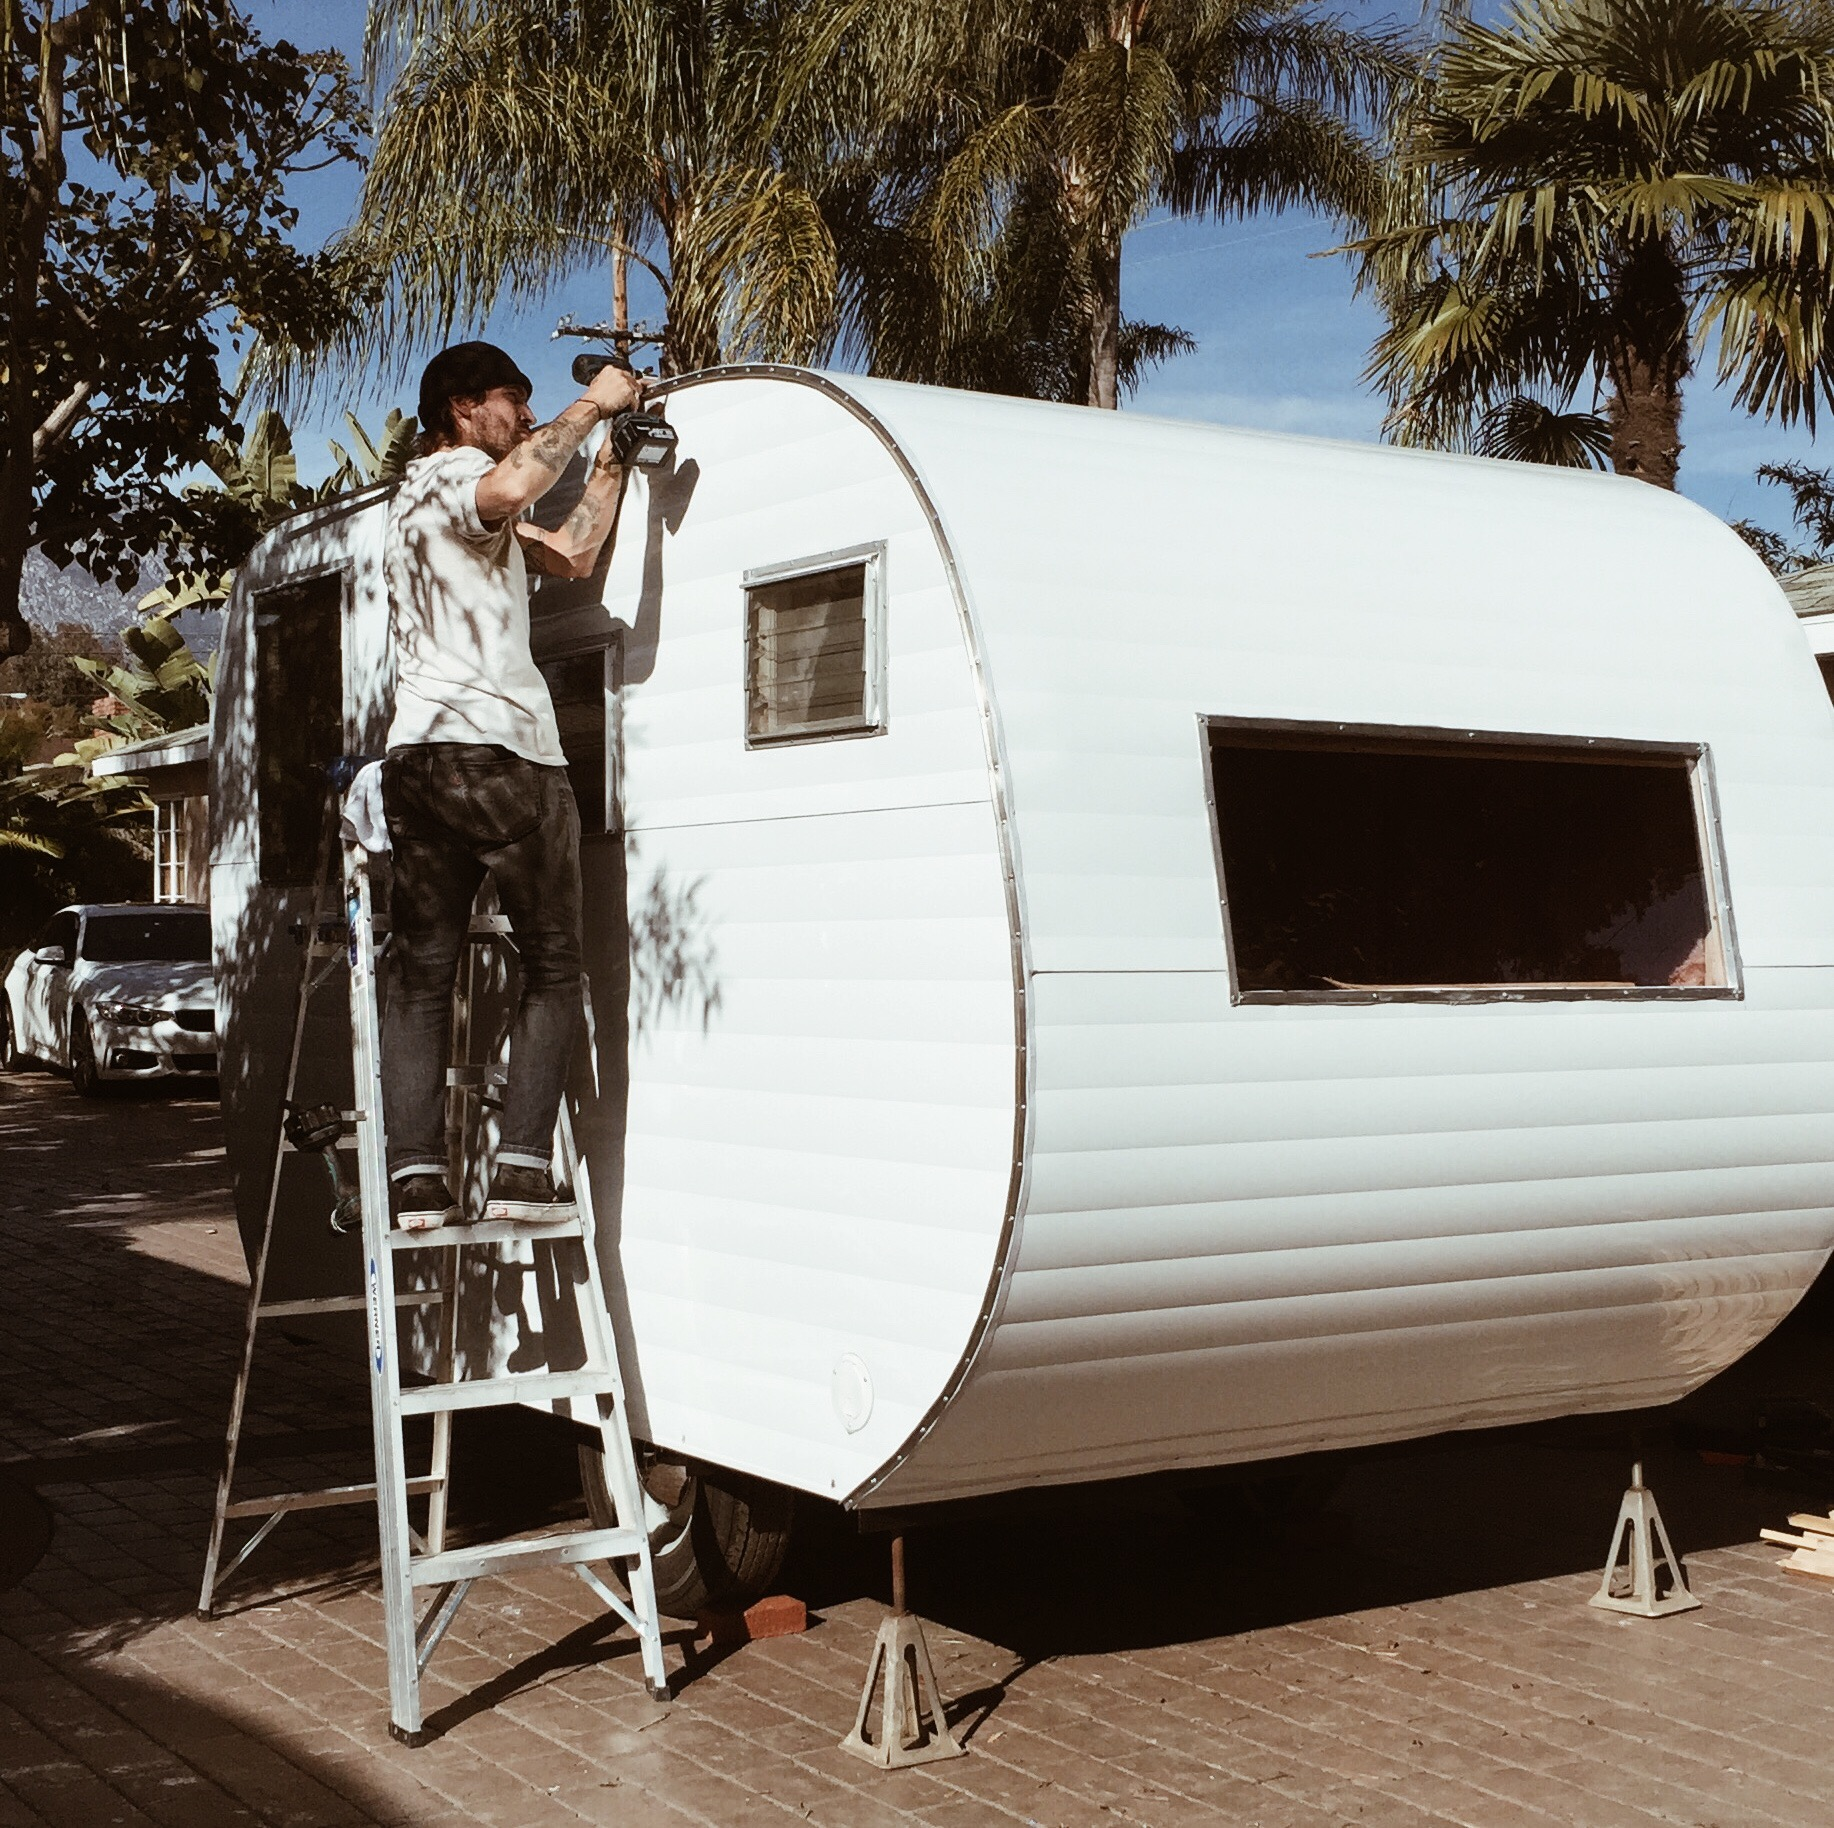 j-rail-camper.JPG